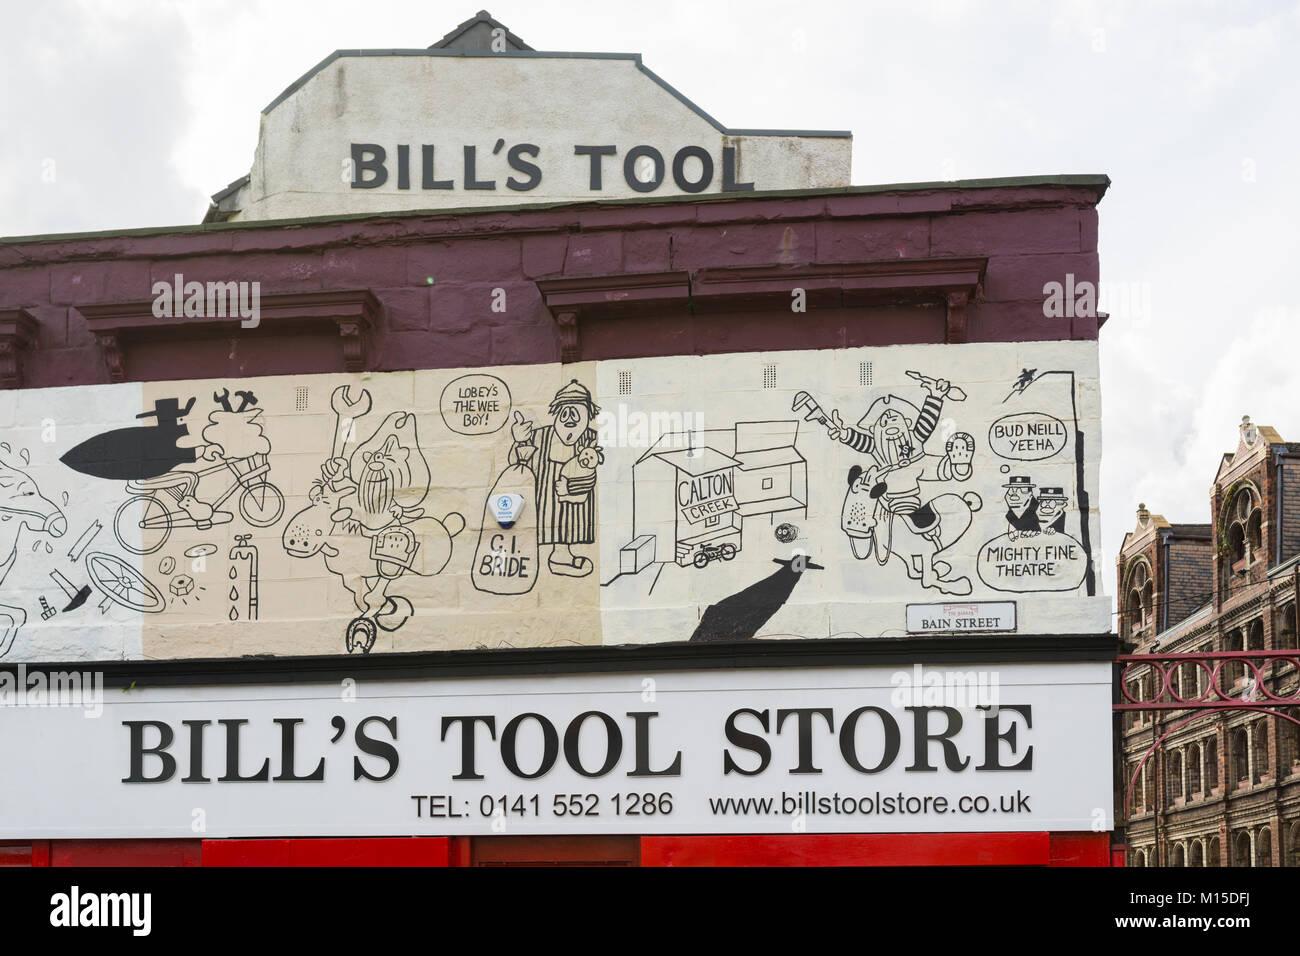 Bill's Tool store et Lobey murale Dosser au Barras, Gallowgate, Glasgow, Écosse, Royaume-Uni Photo Stock